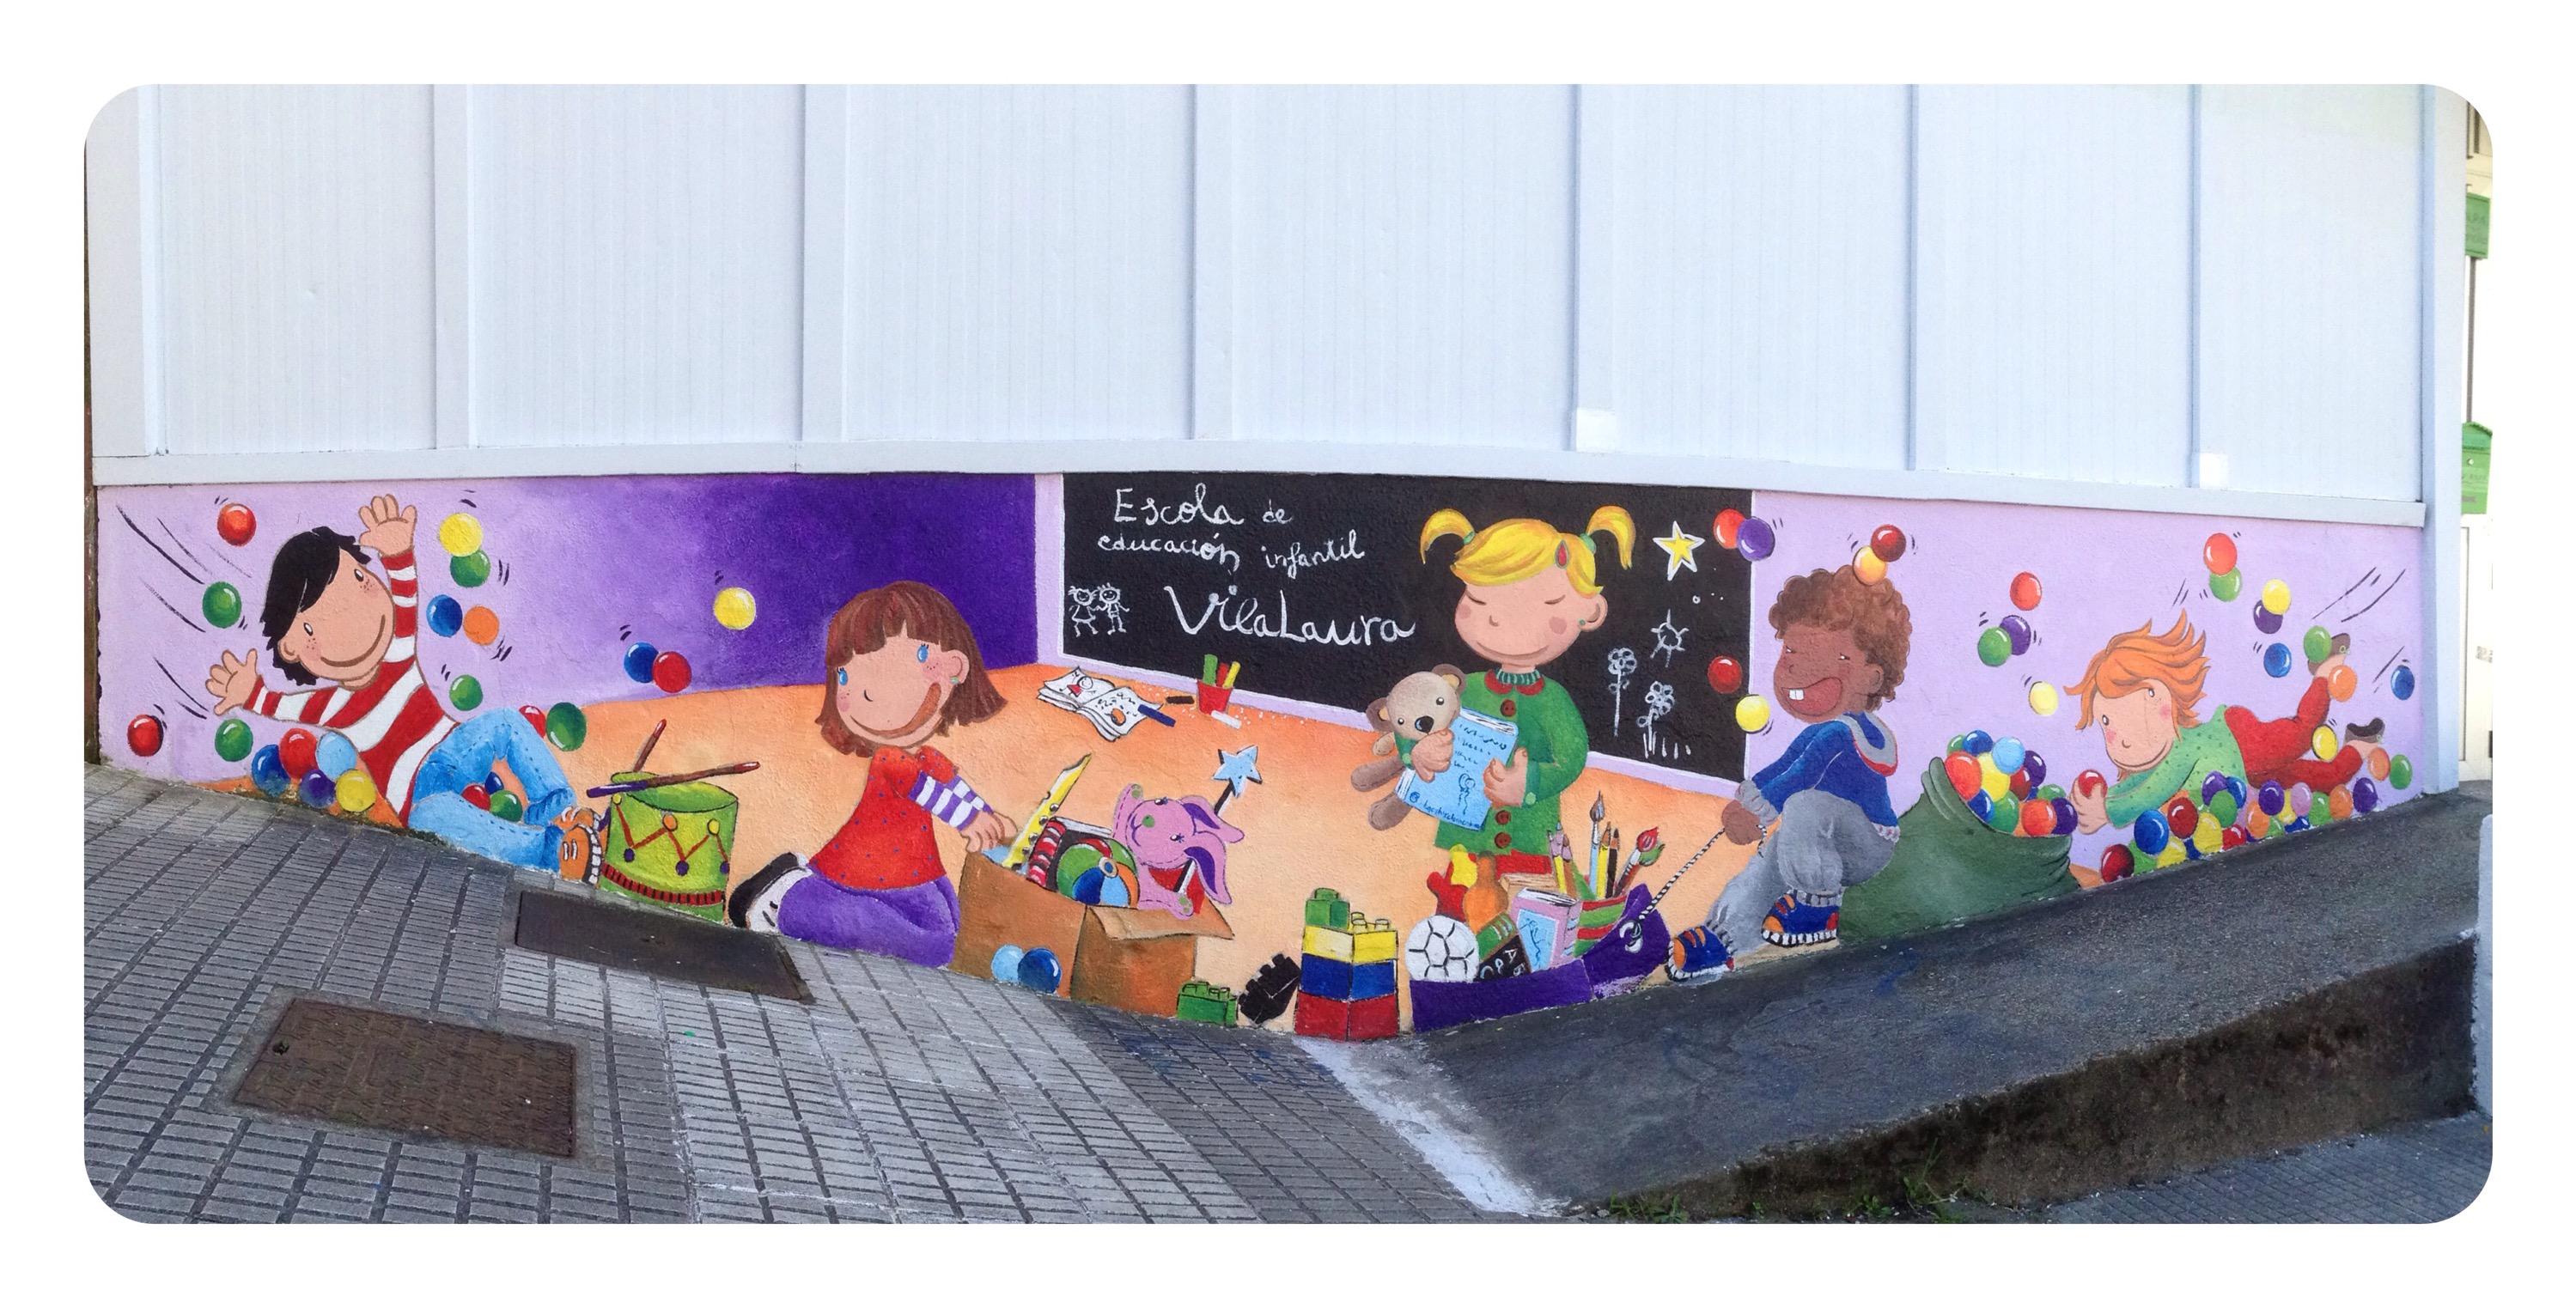 Mural escola educaci n infantil vilalaura vigo bgoph y for Plafones de pared infantiles